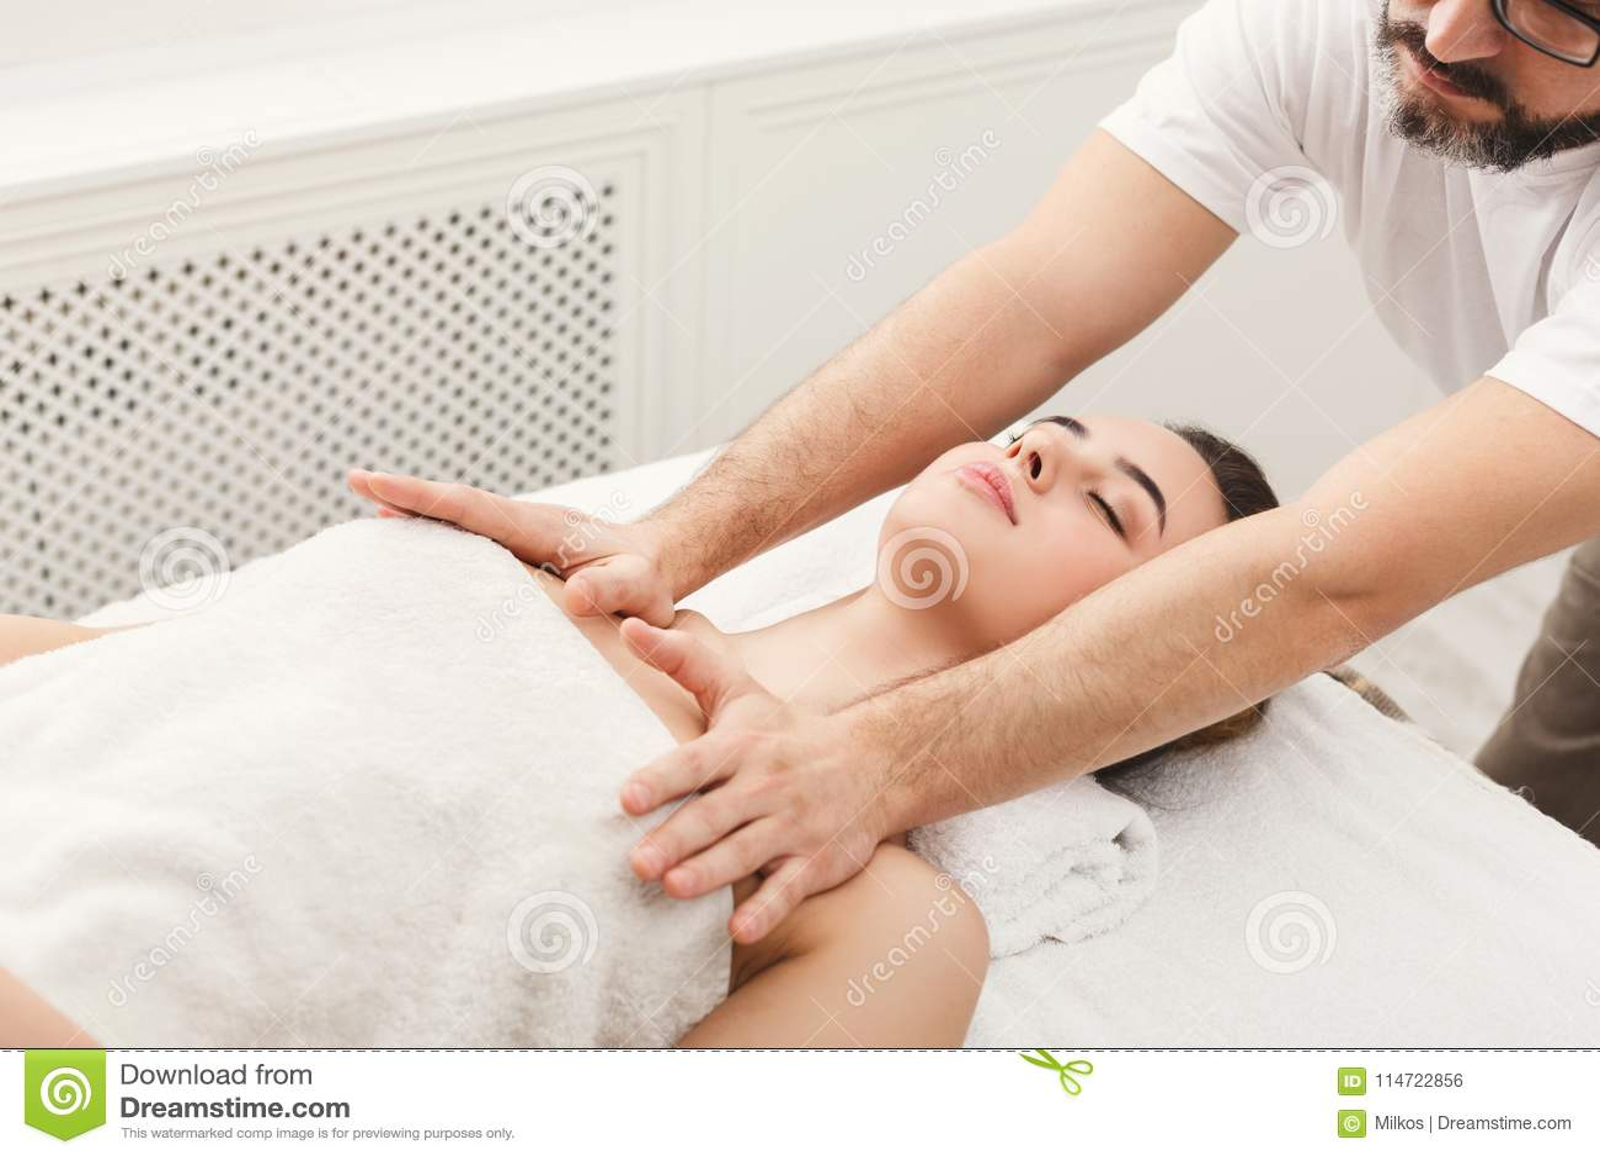 Adult female massage